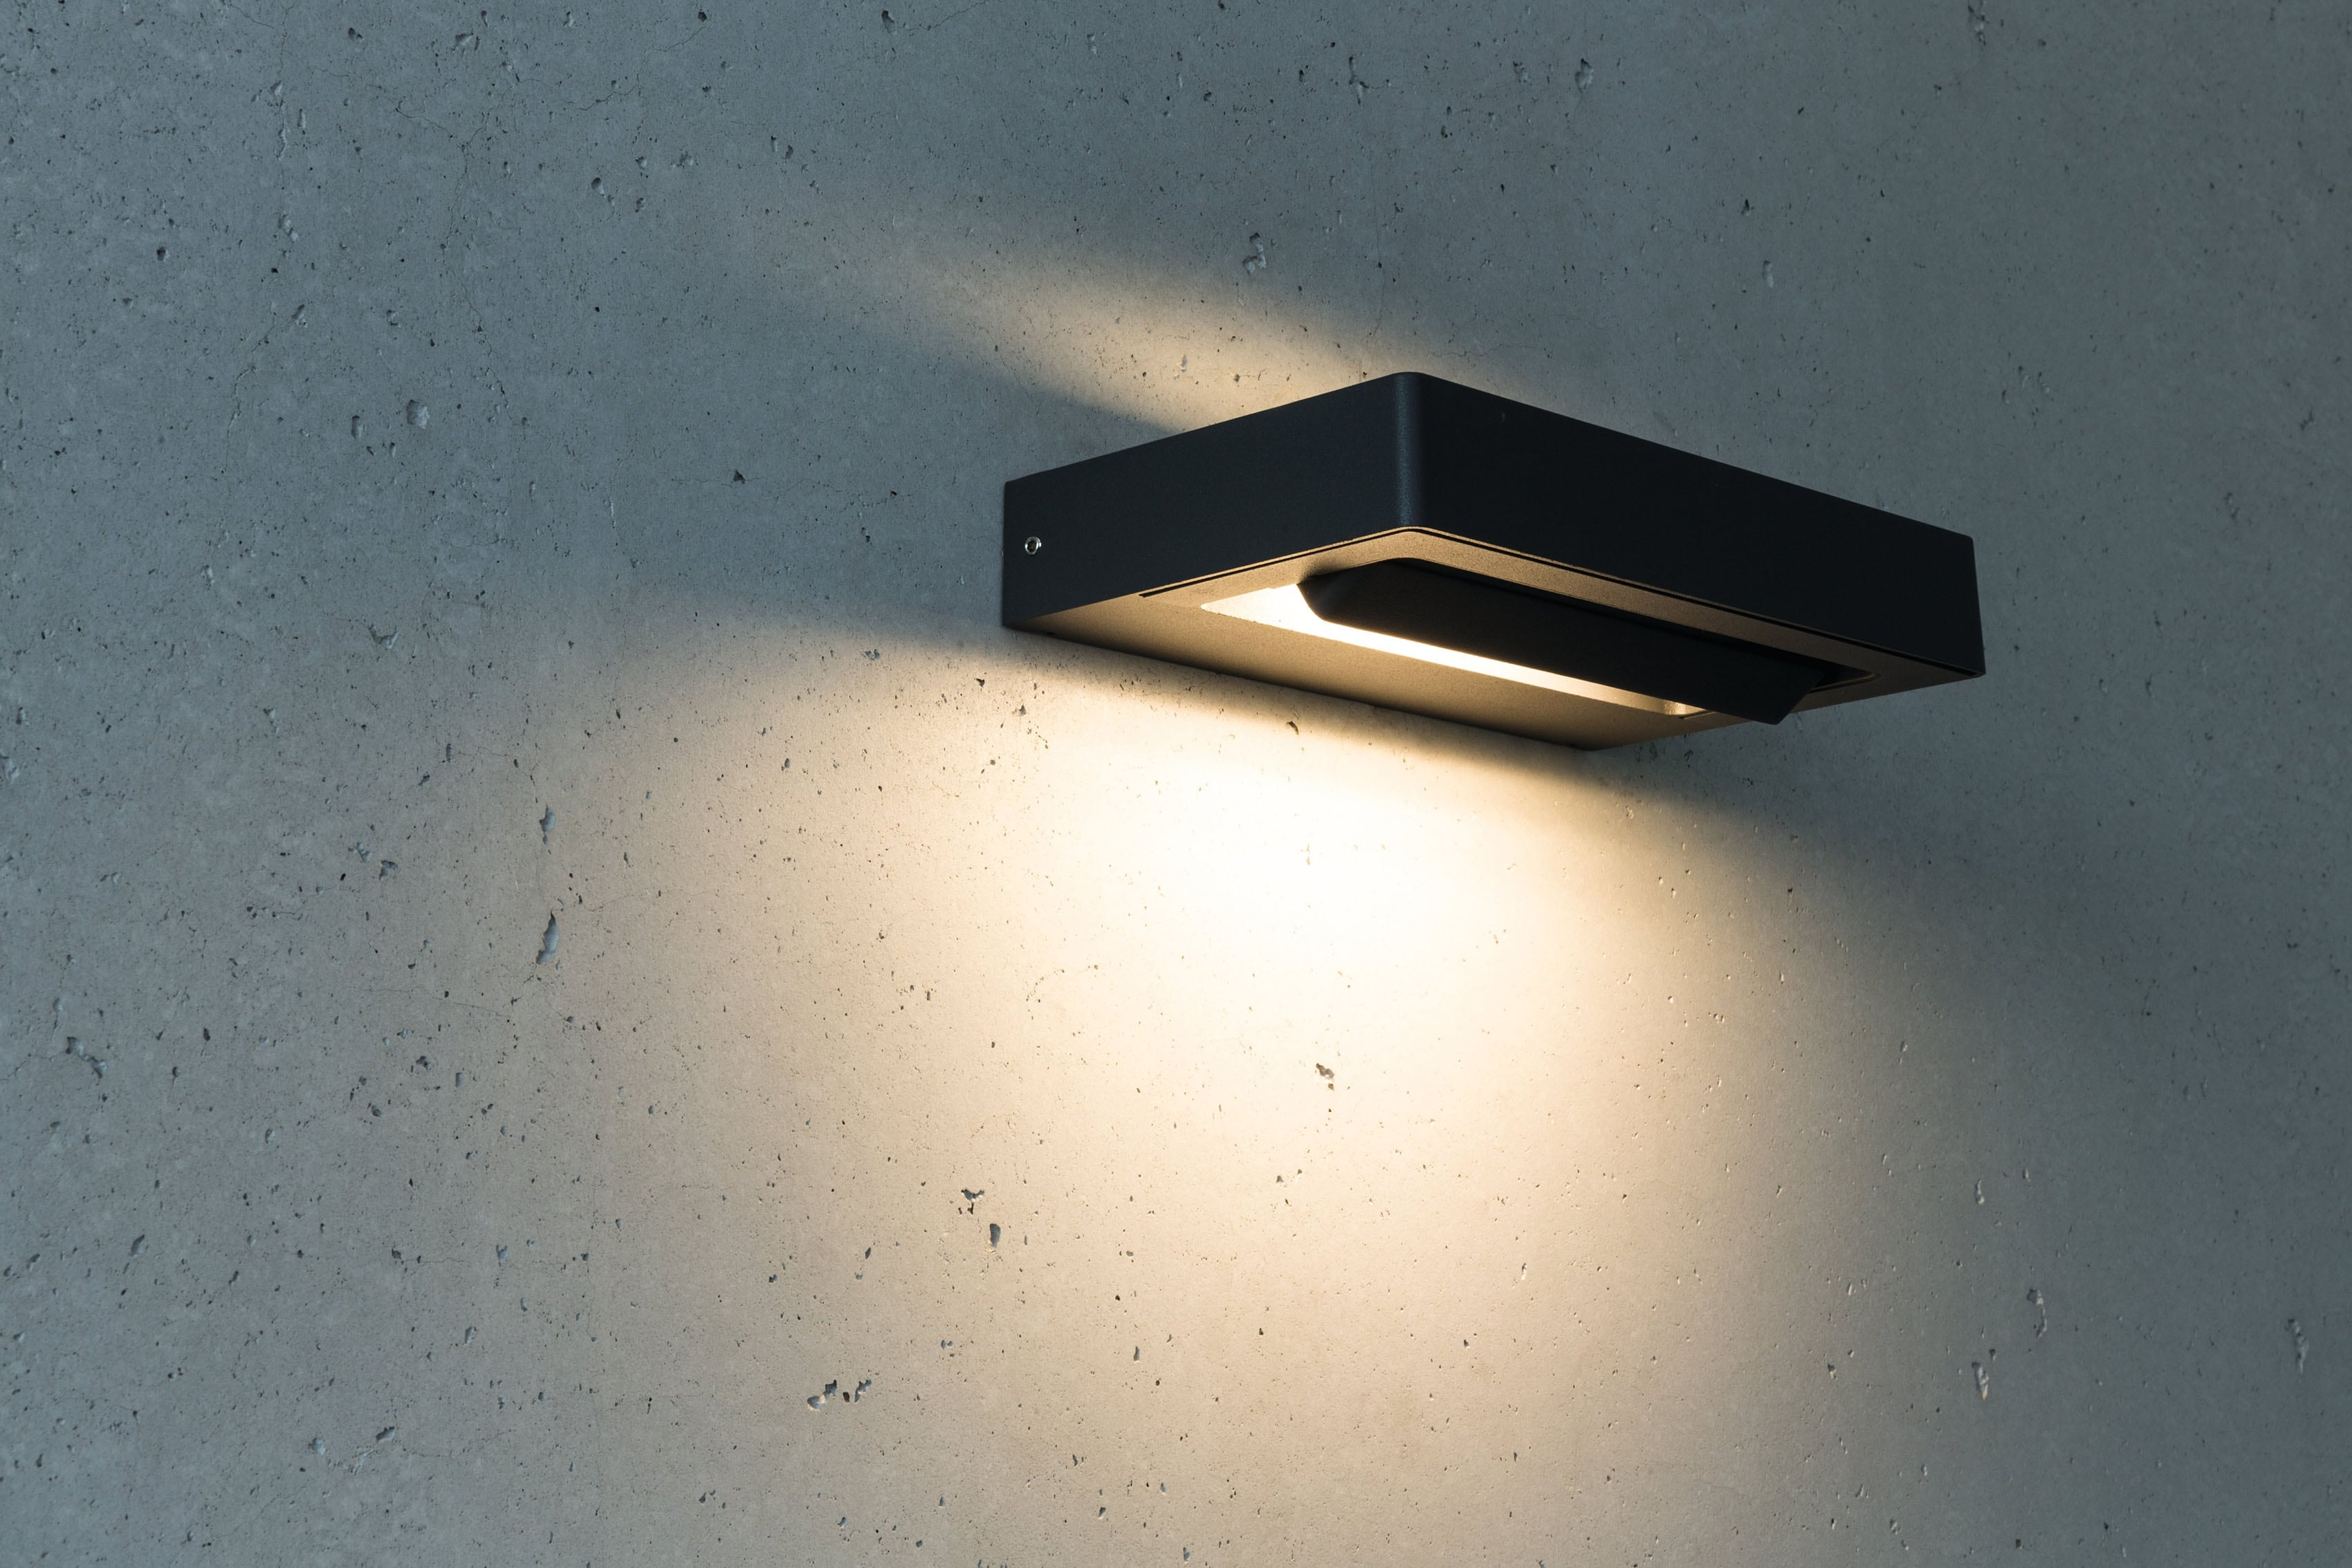 HEITRONIC LED Wandleuchte Cordoba, LED-Modul, 1 St., Warmweiß, Leuchteinheit 320° schwenkbar